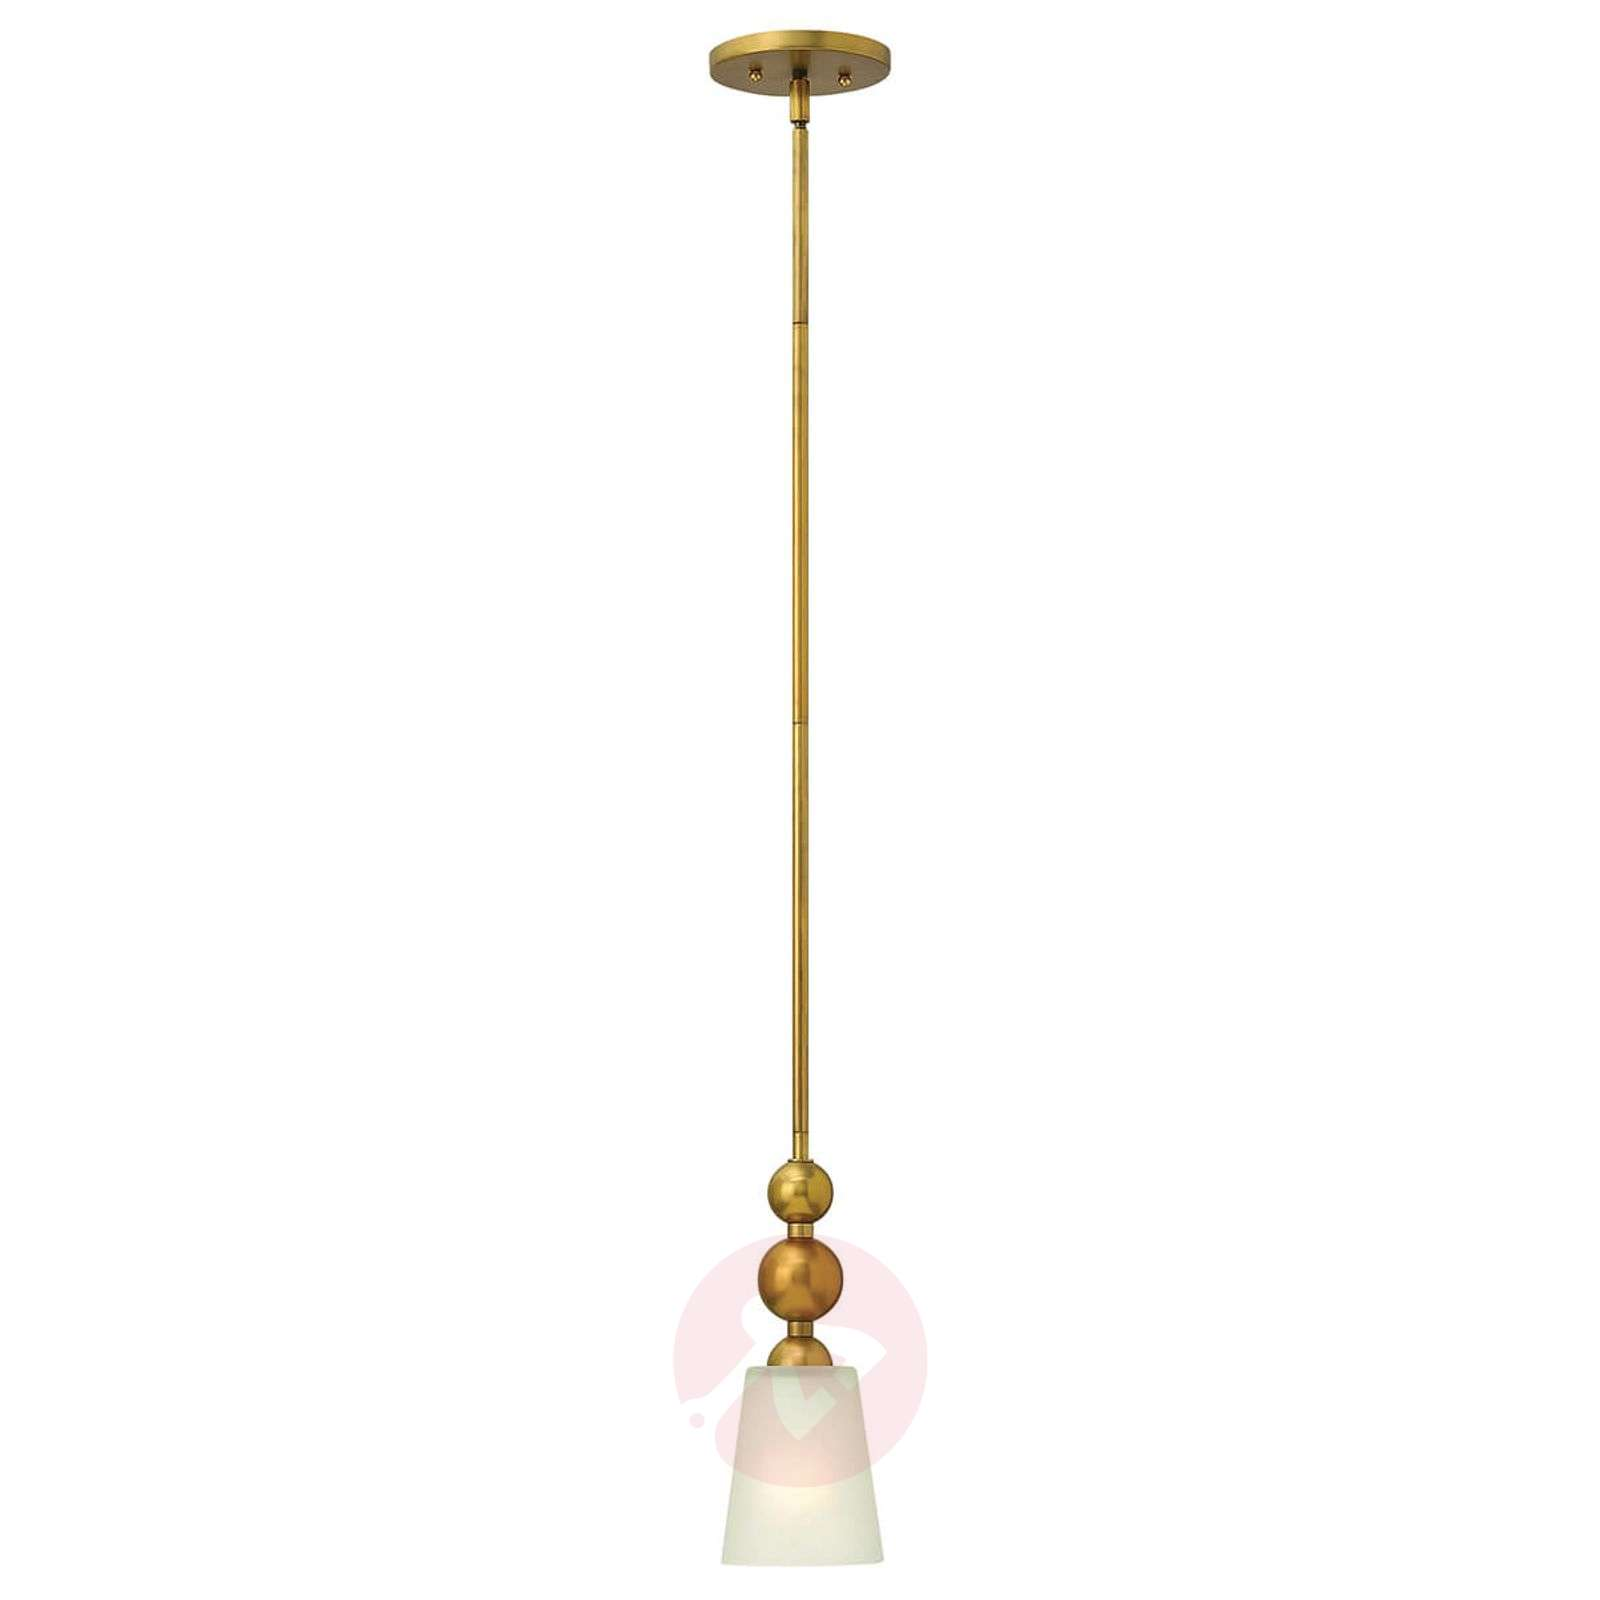 Hanging light Zelda in a glamorous design-3048482-01